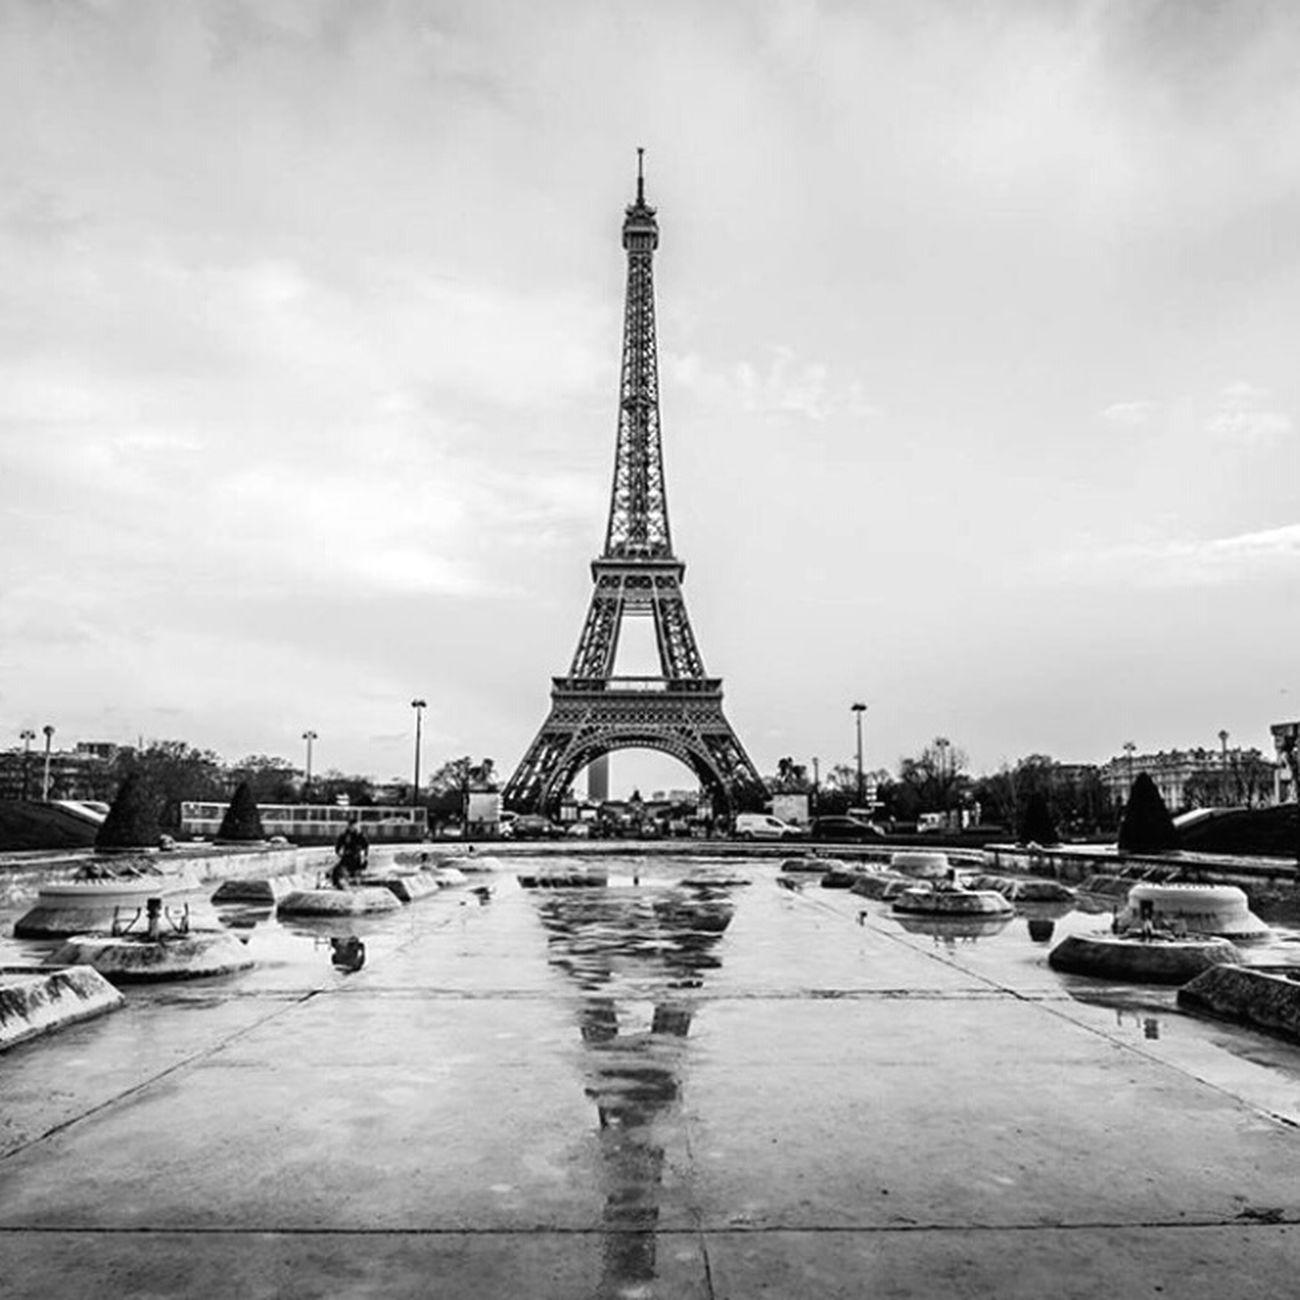 Paris Torre Eiffel Relaxing Cute Bealtiful Love Loveit Hanging Out Phonecamera Style Taking Photos Viajar Goodnight Followme Money